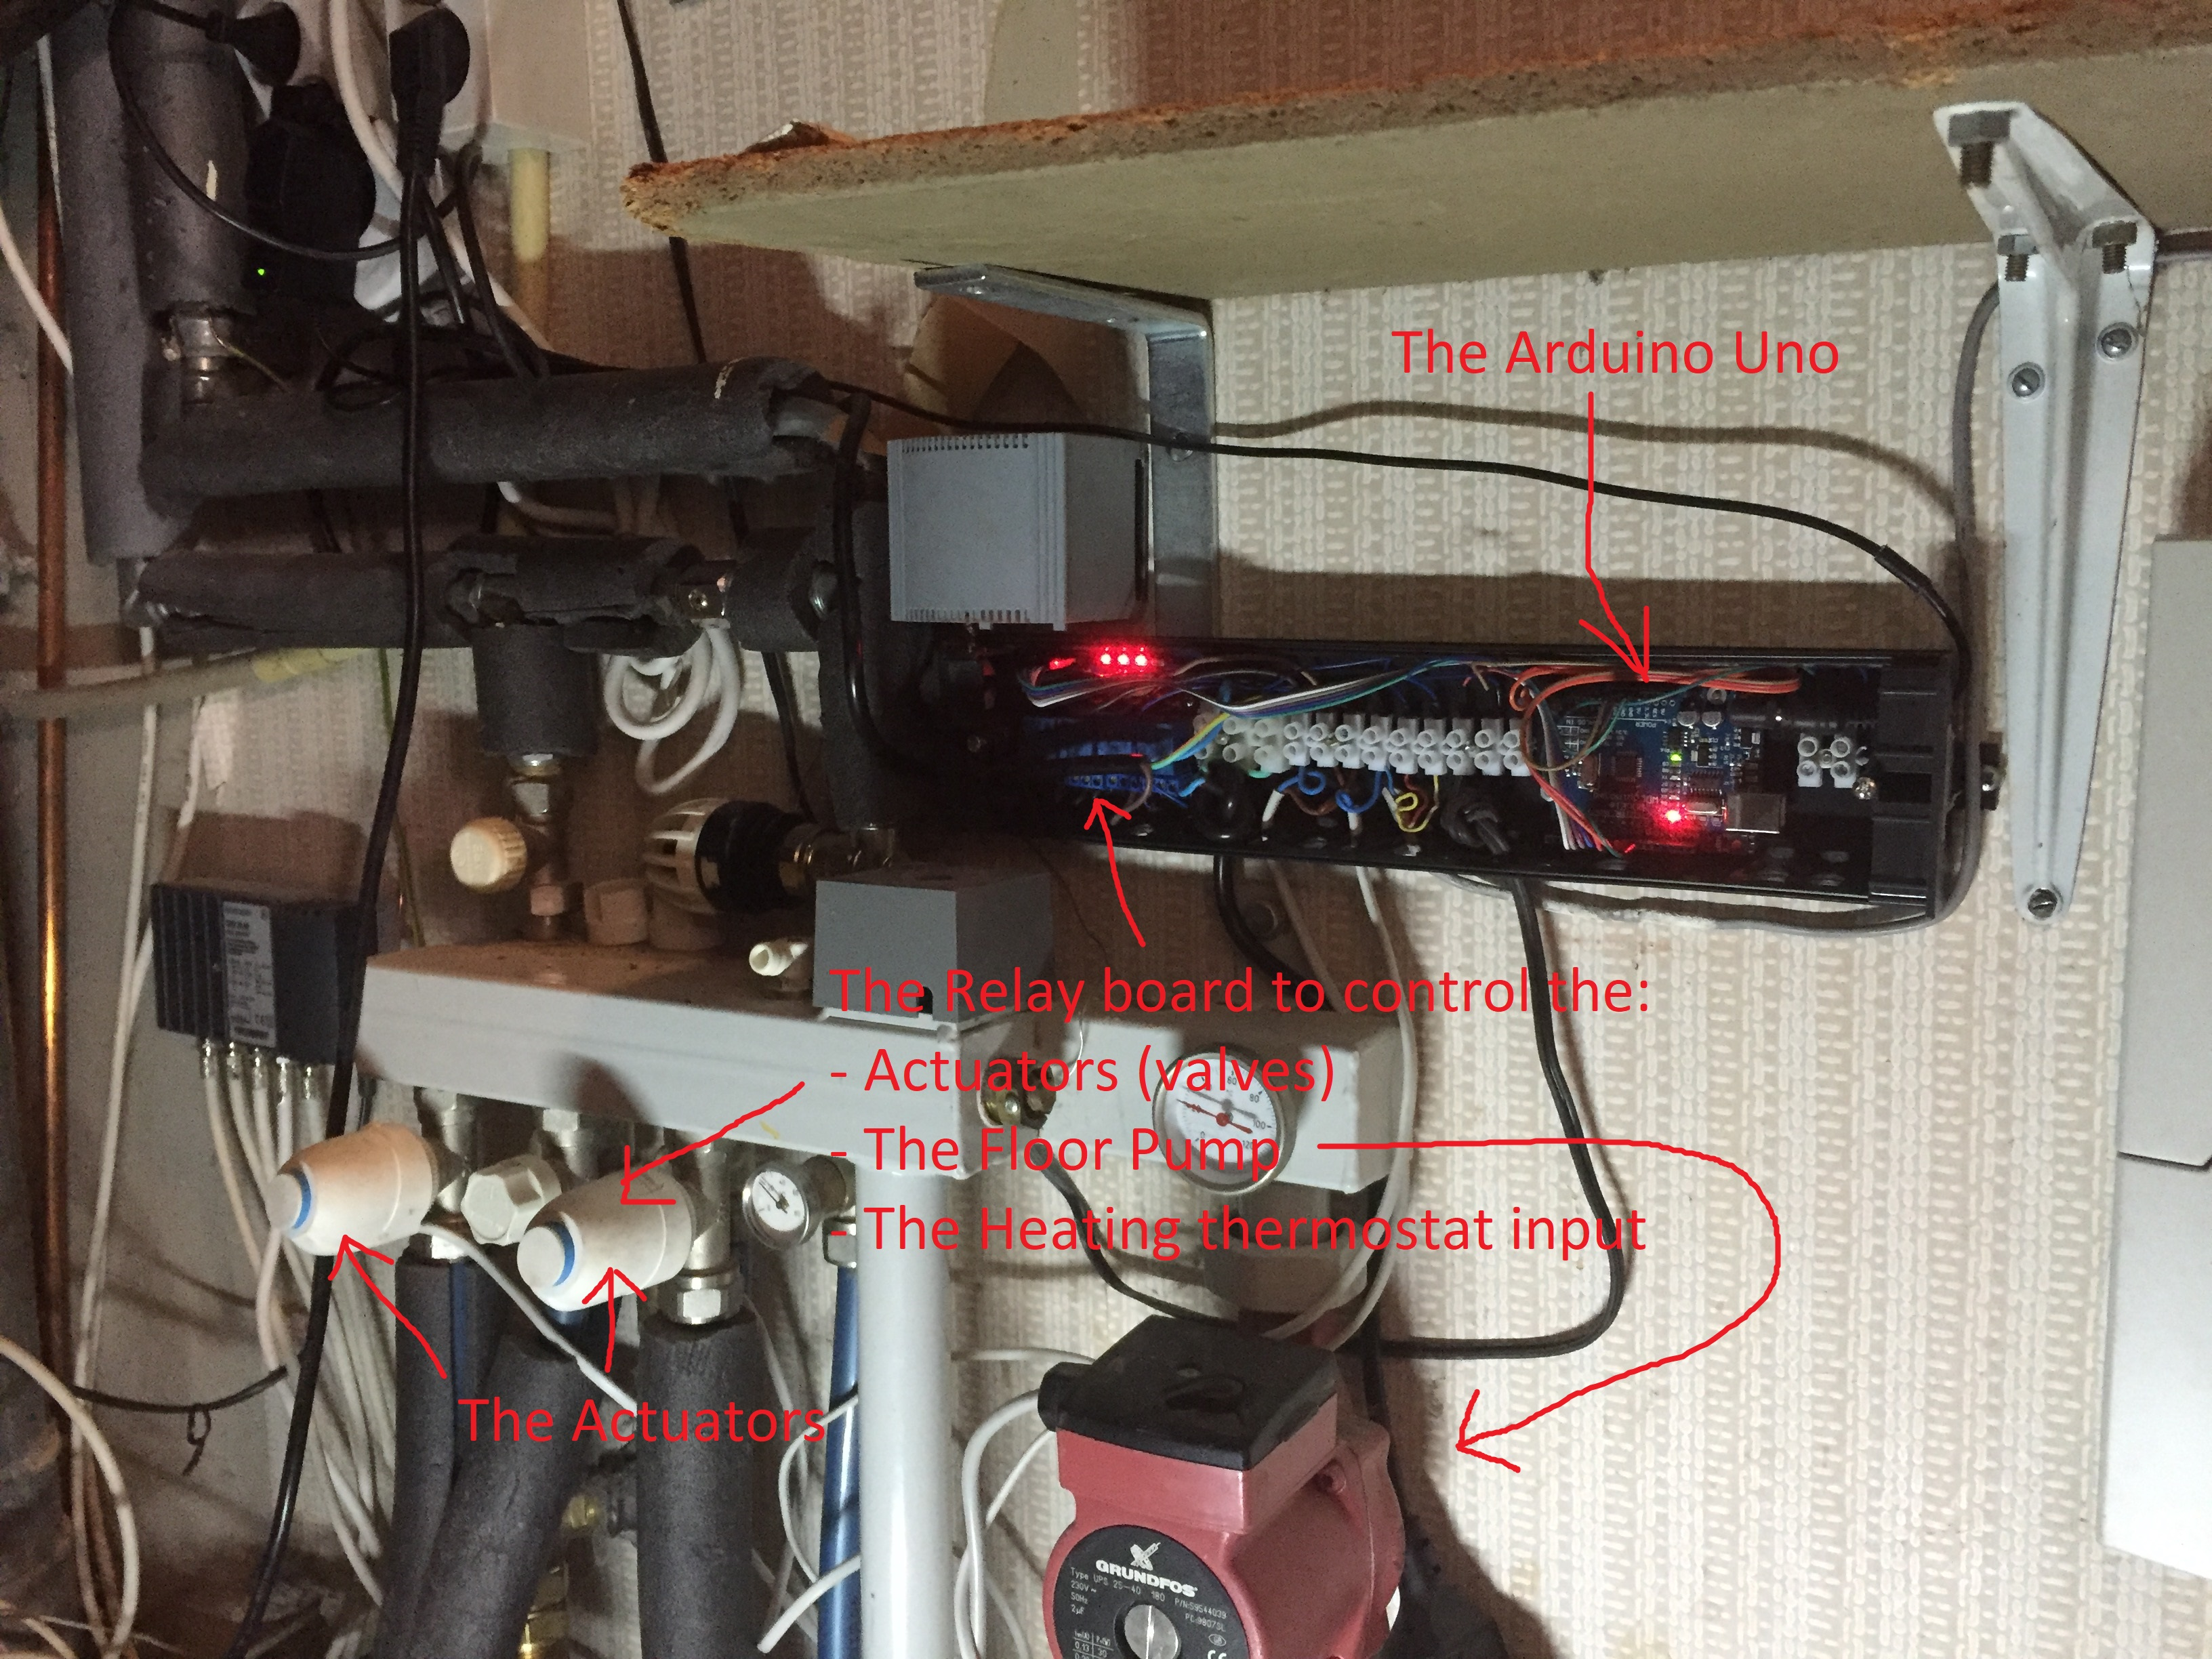 underfloor heating wiring diagram s plan allen bradley typical diagrams multi zone controller hackster io 2016 07 30 14 ynuqomvx9g